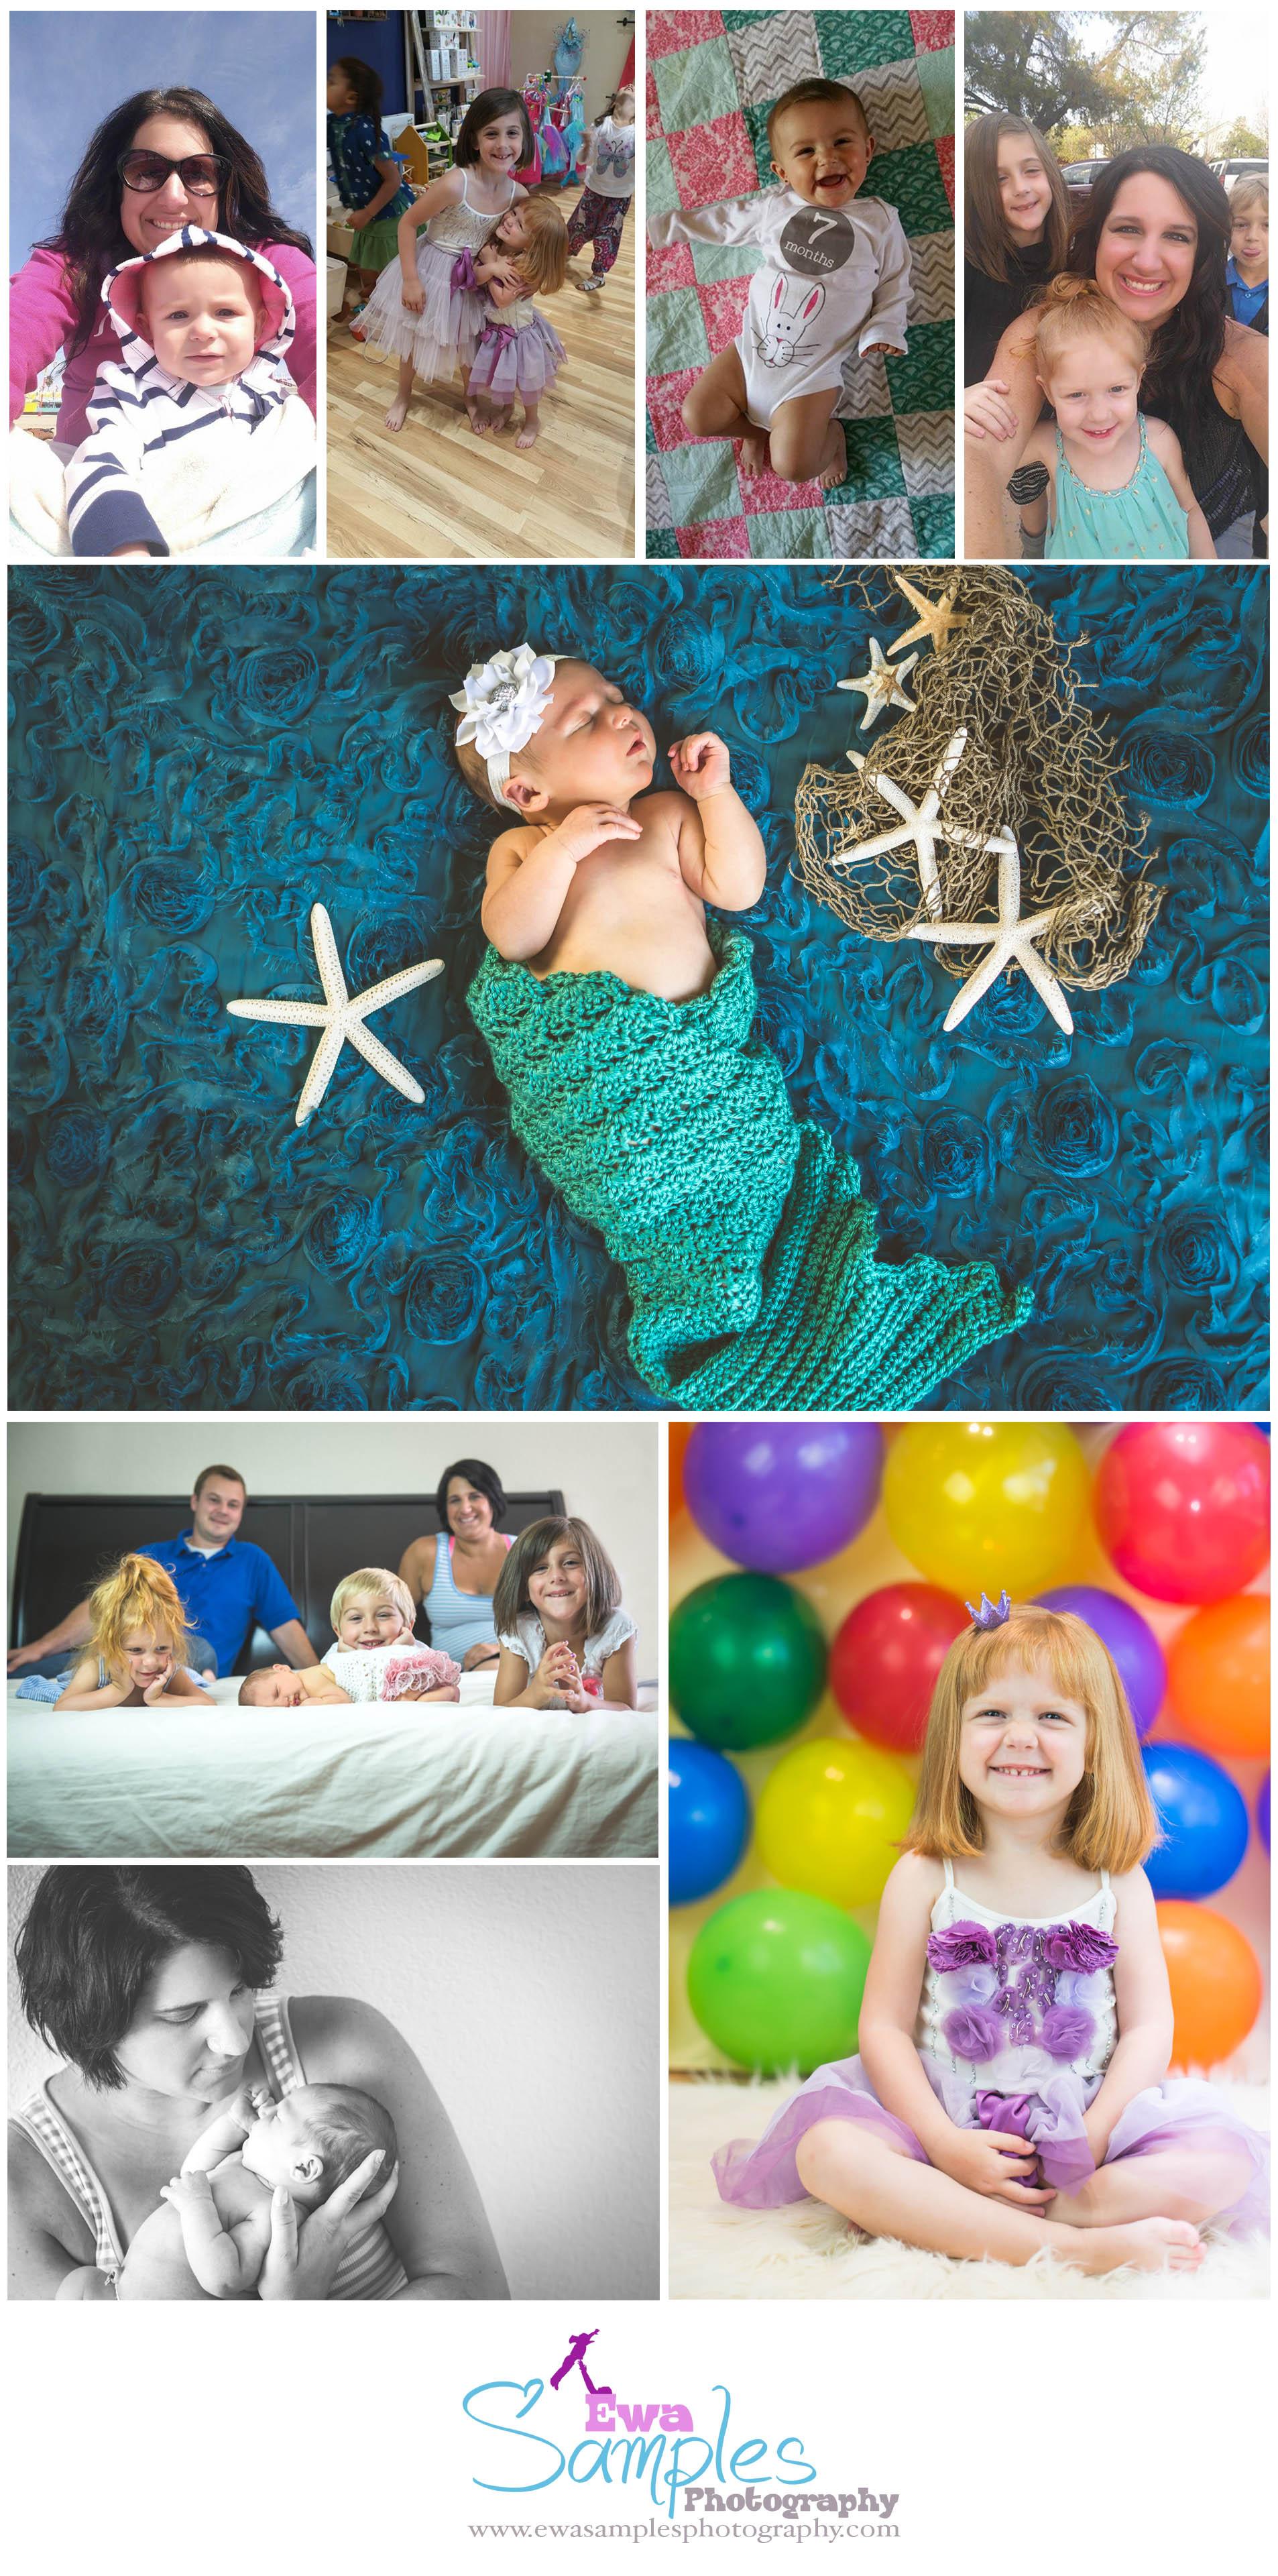 Mother's Day Mini Session, Ewa Samples Photography, San Jose